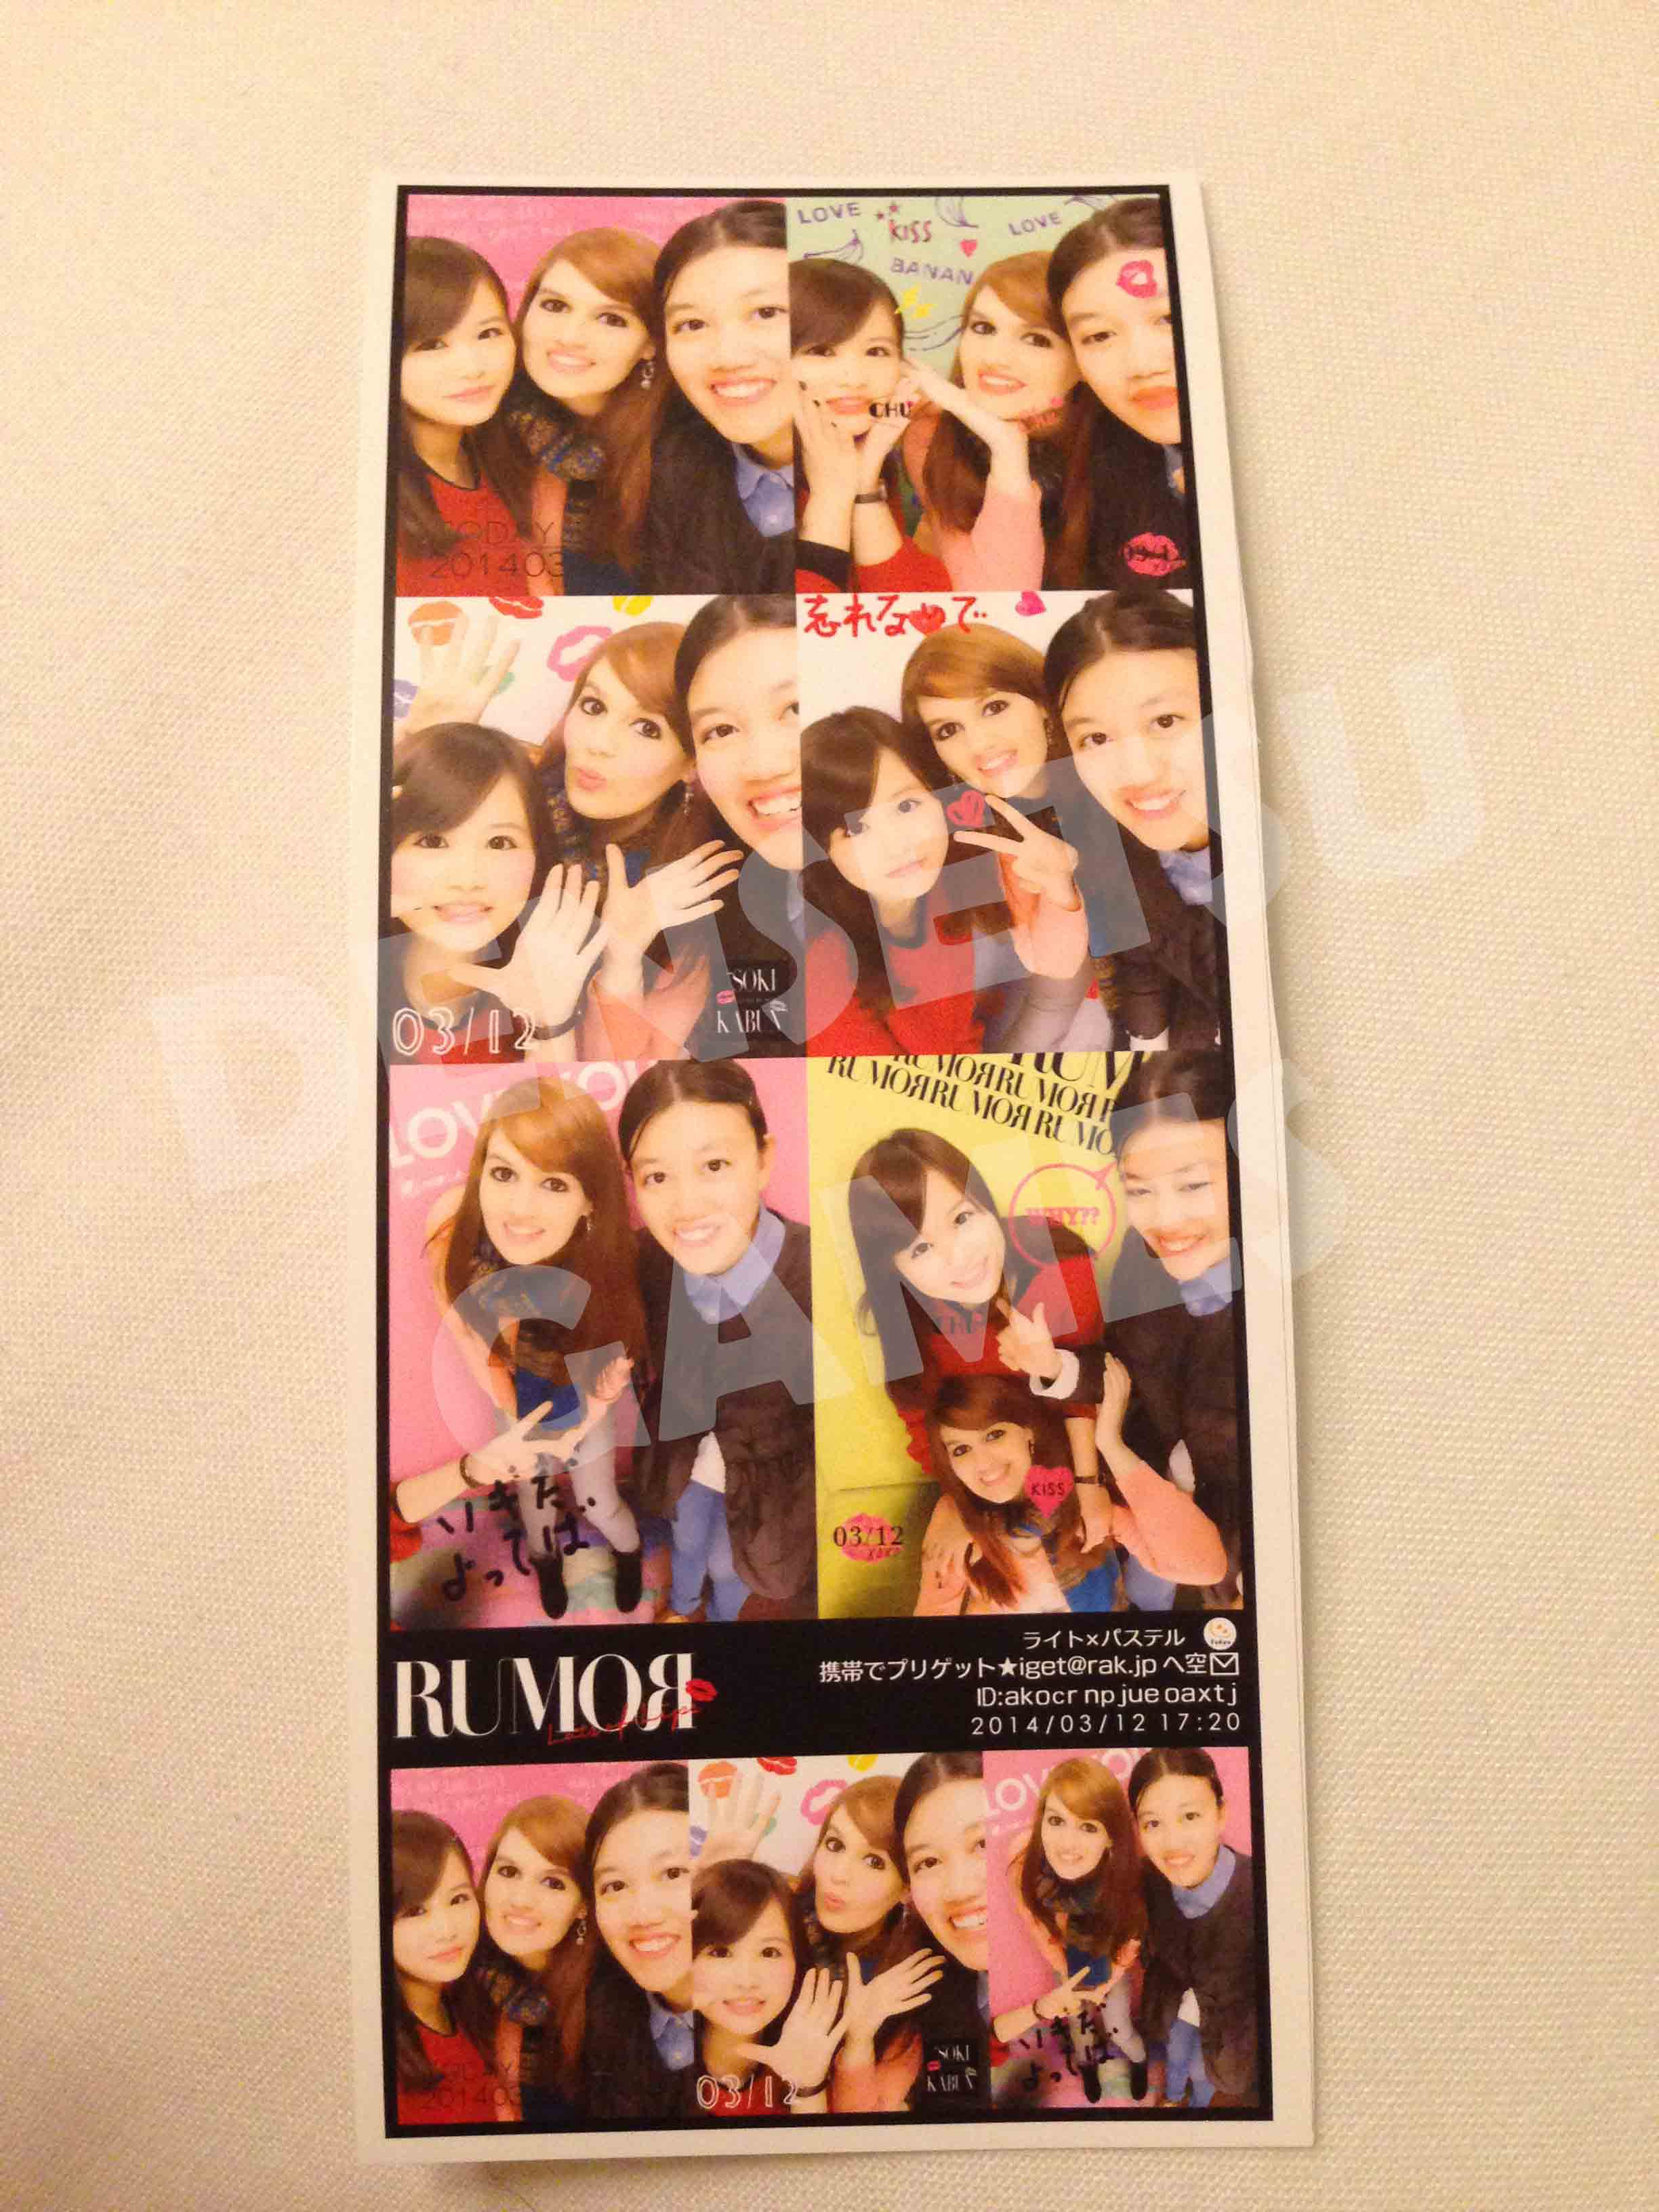 Fotos de Purikura impressas